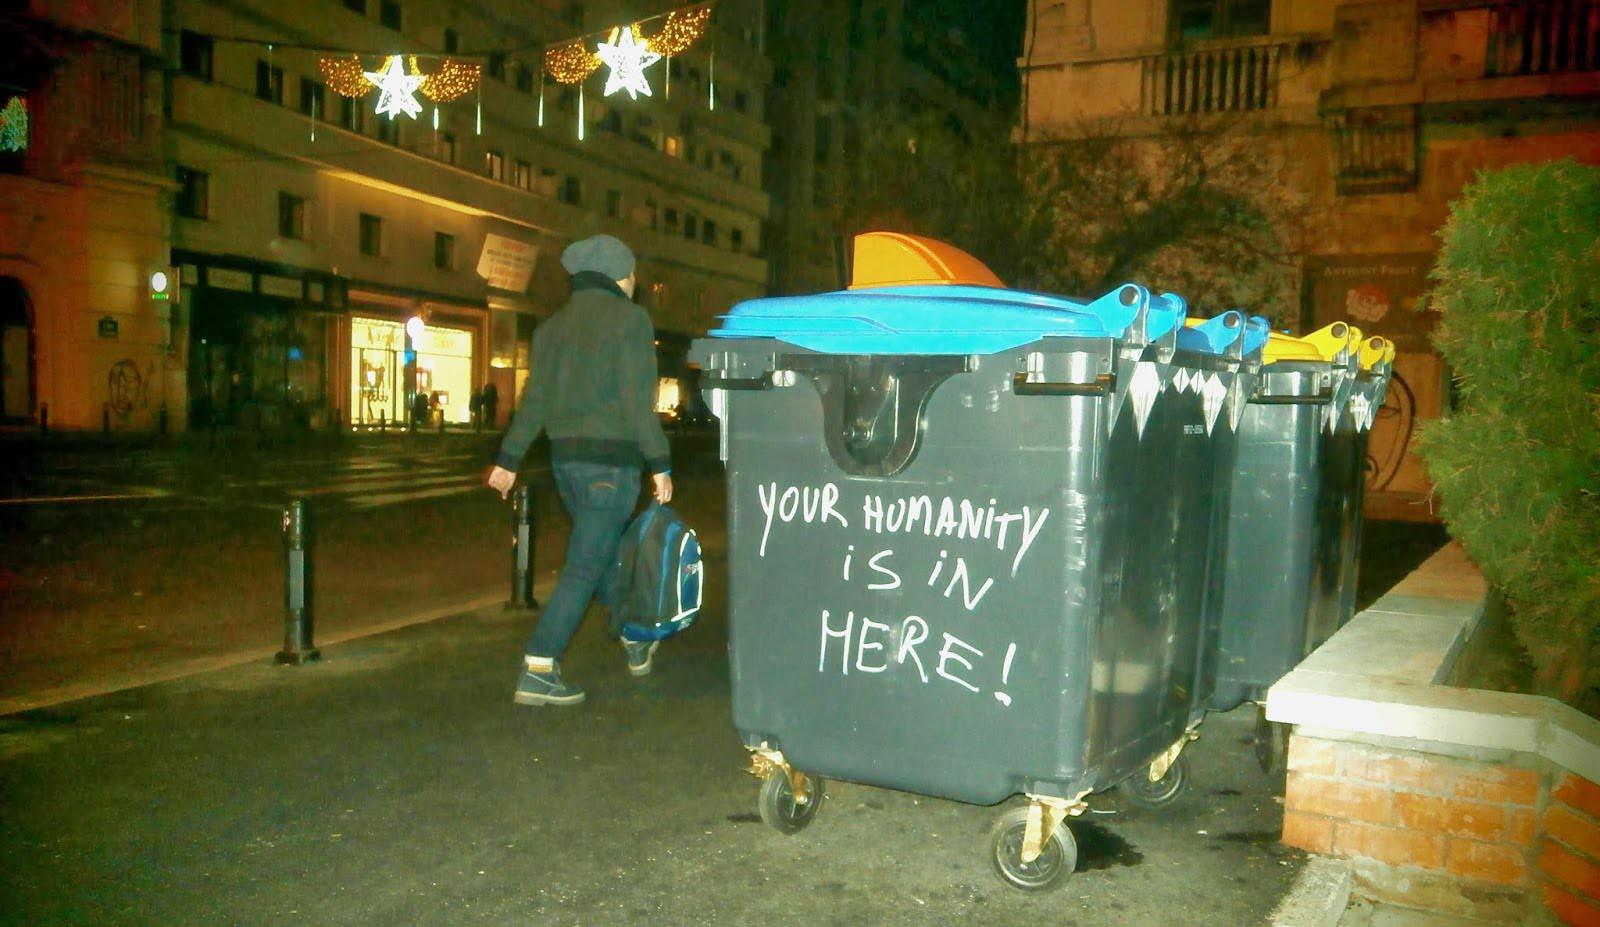 Dumpster Notes